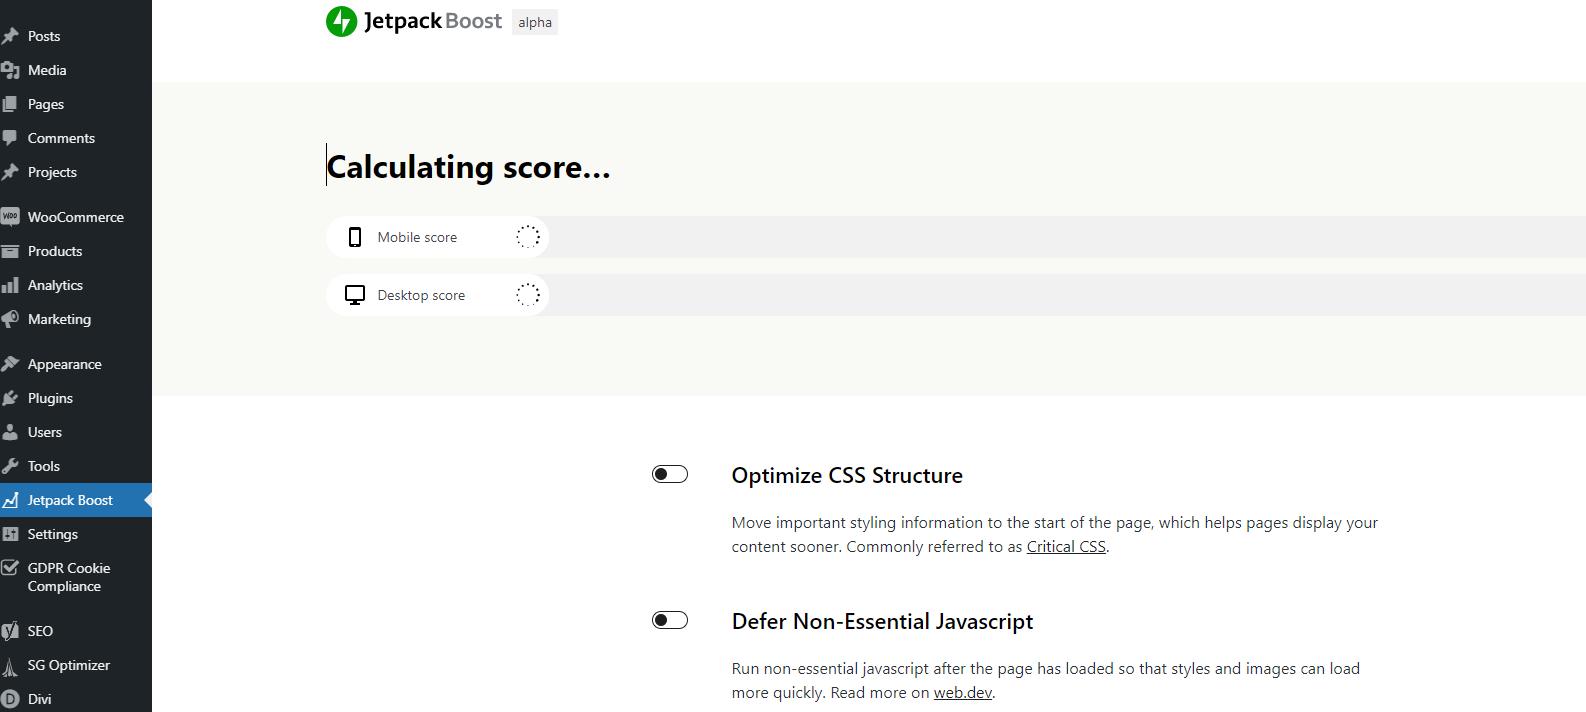 Jetpack boost calculating web scores